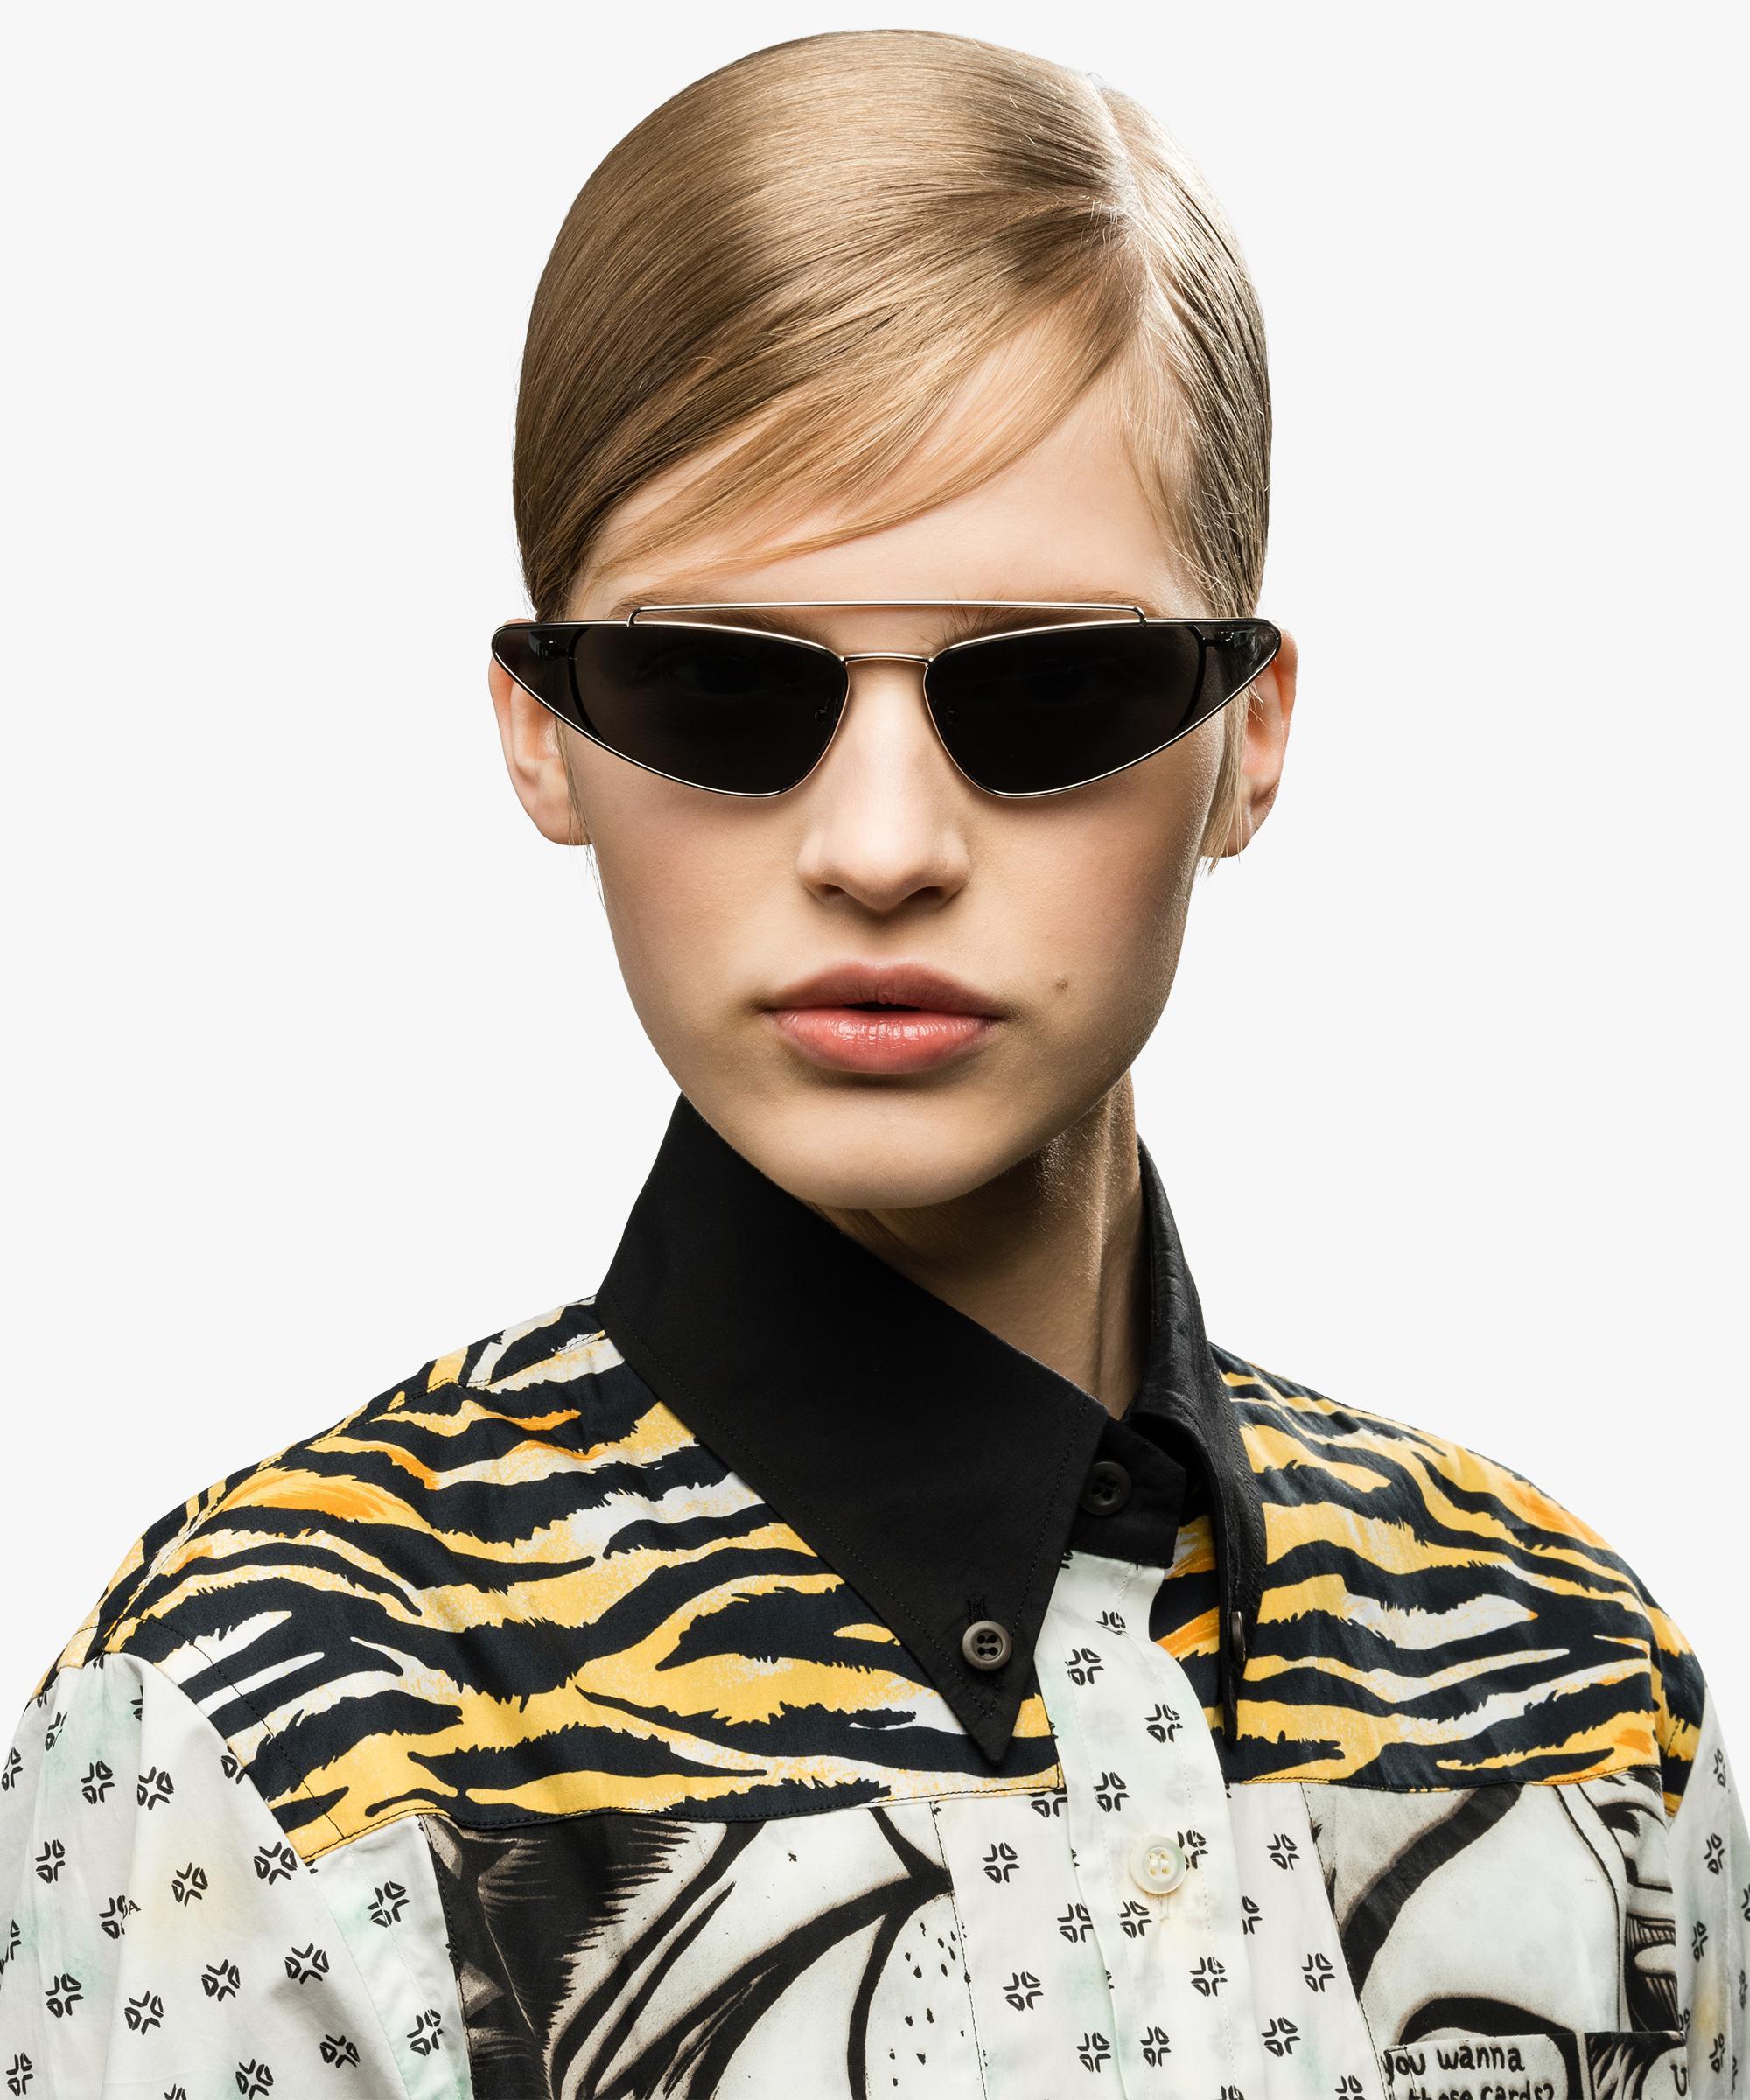 9260b35a9e28 Lyst - Prada Runway Eyewear in Gray